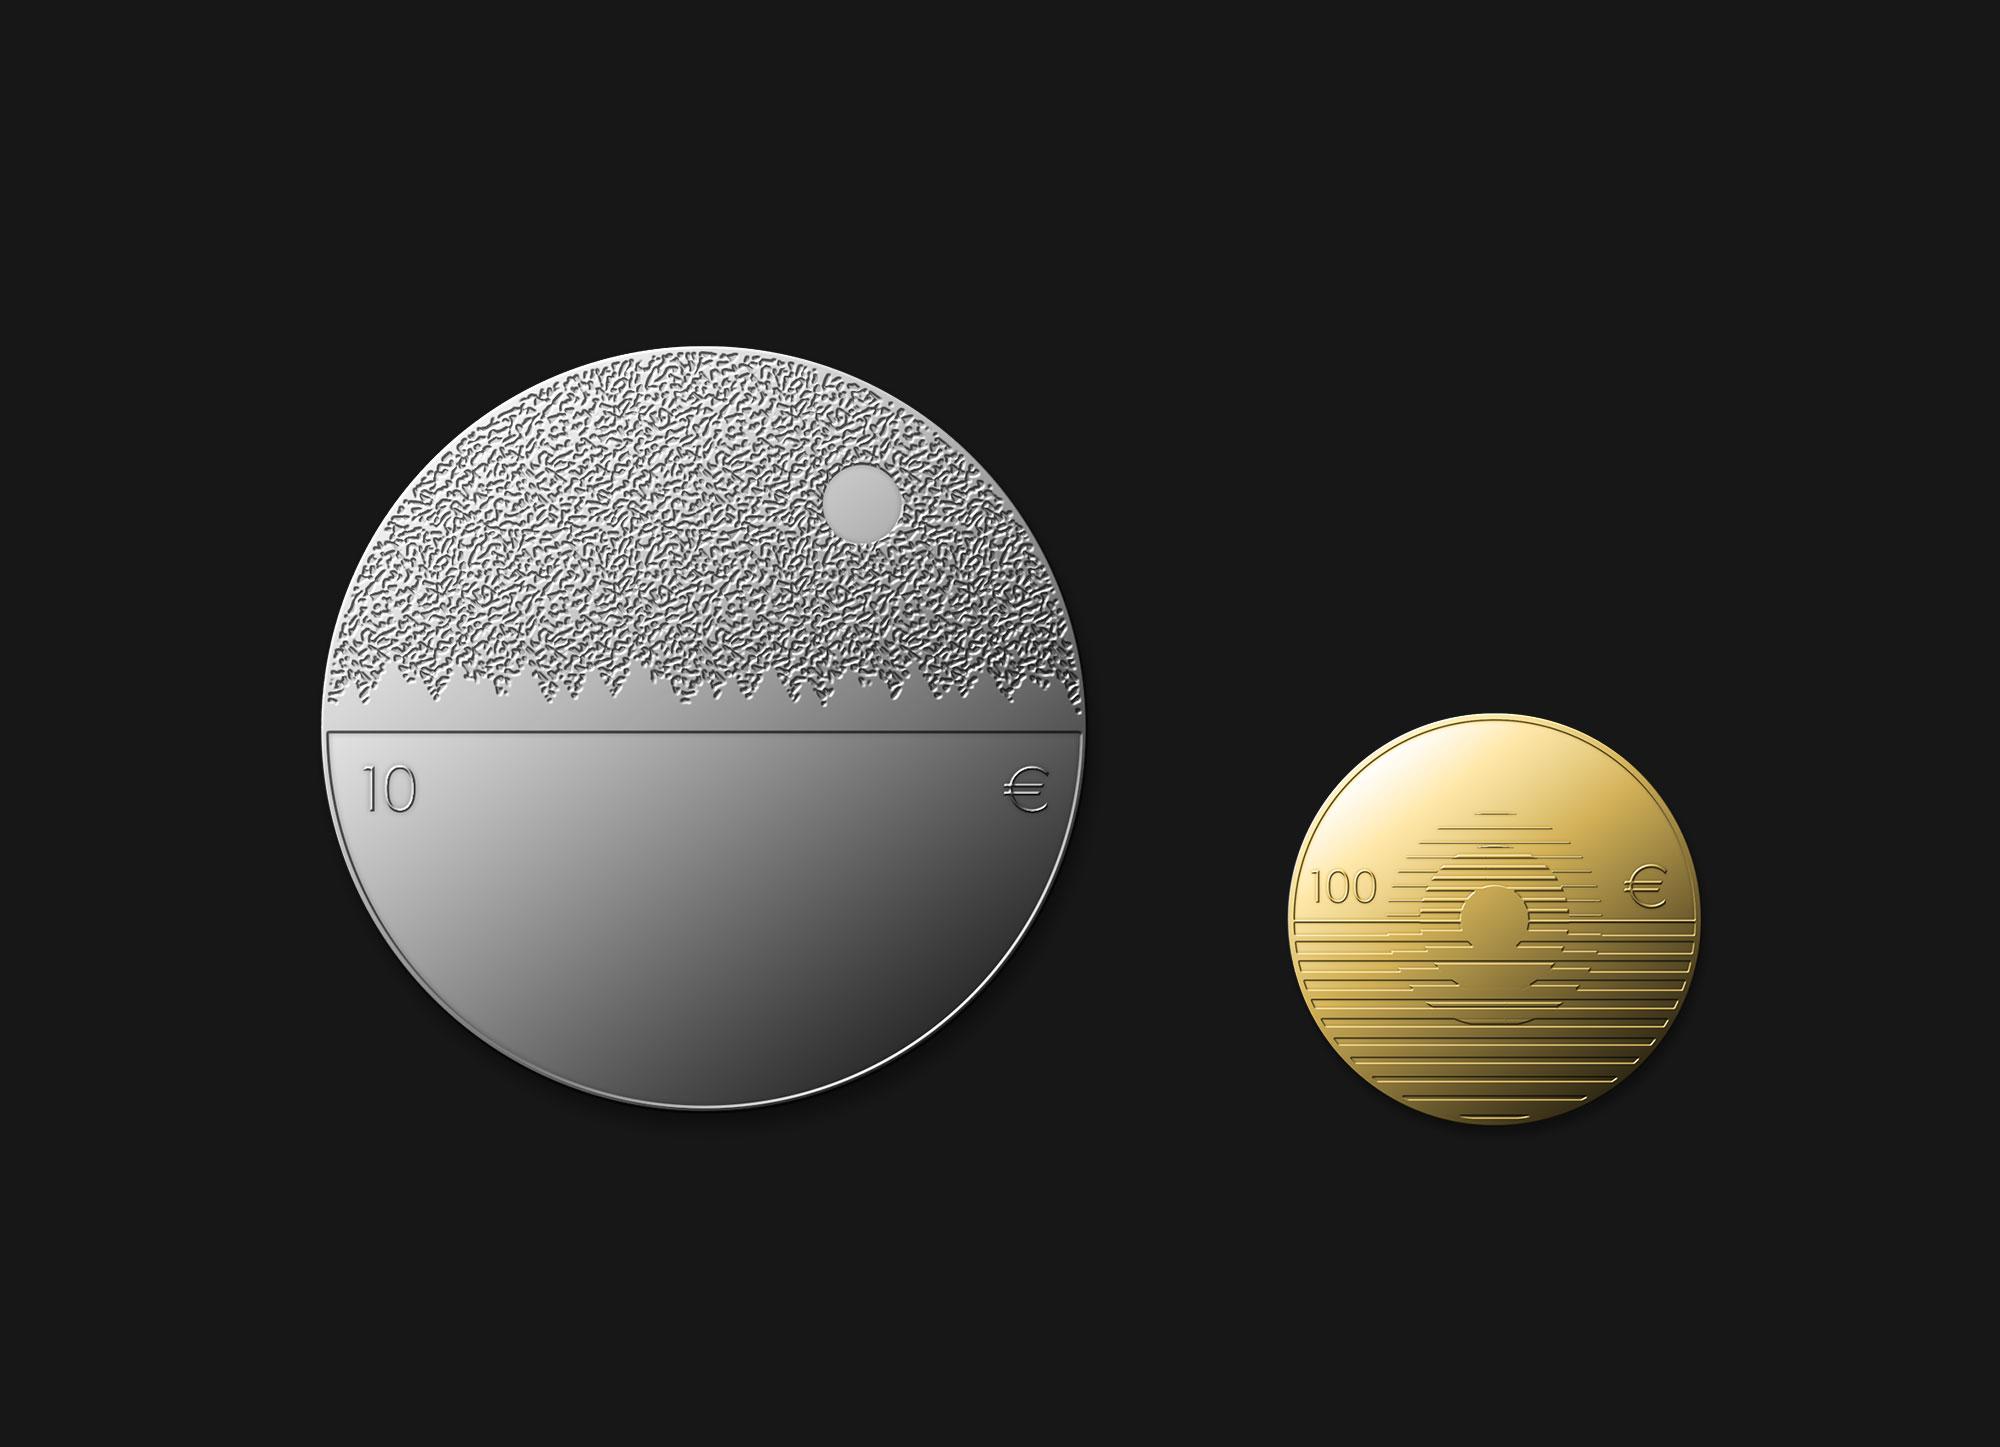 solstice_centenary_coins